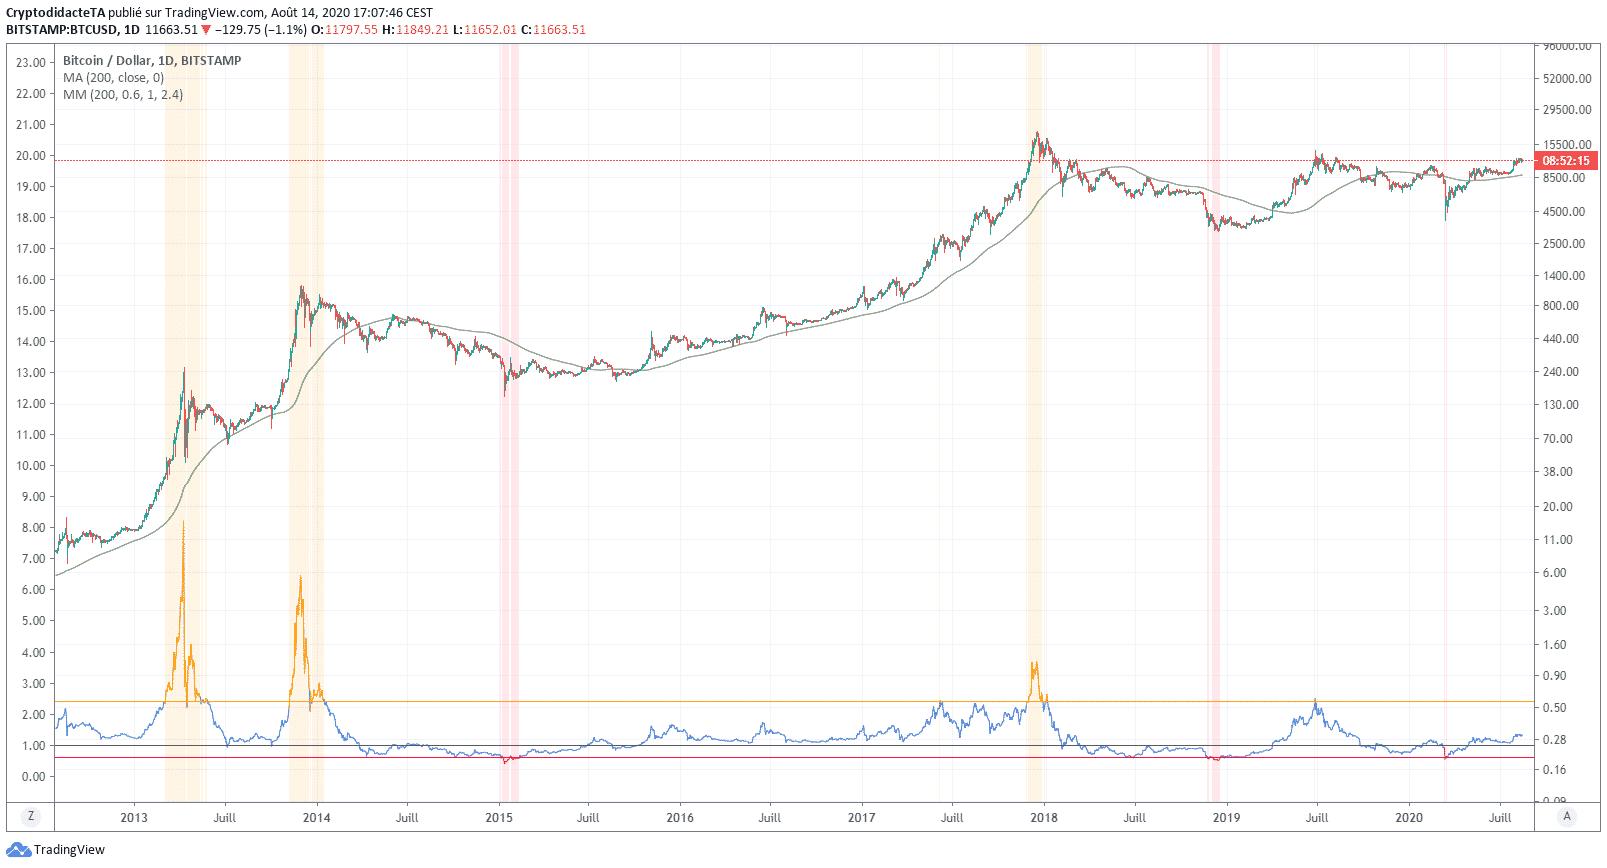 Multiple de Mayer selon Cryptodidacte sur TradingView